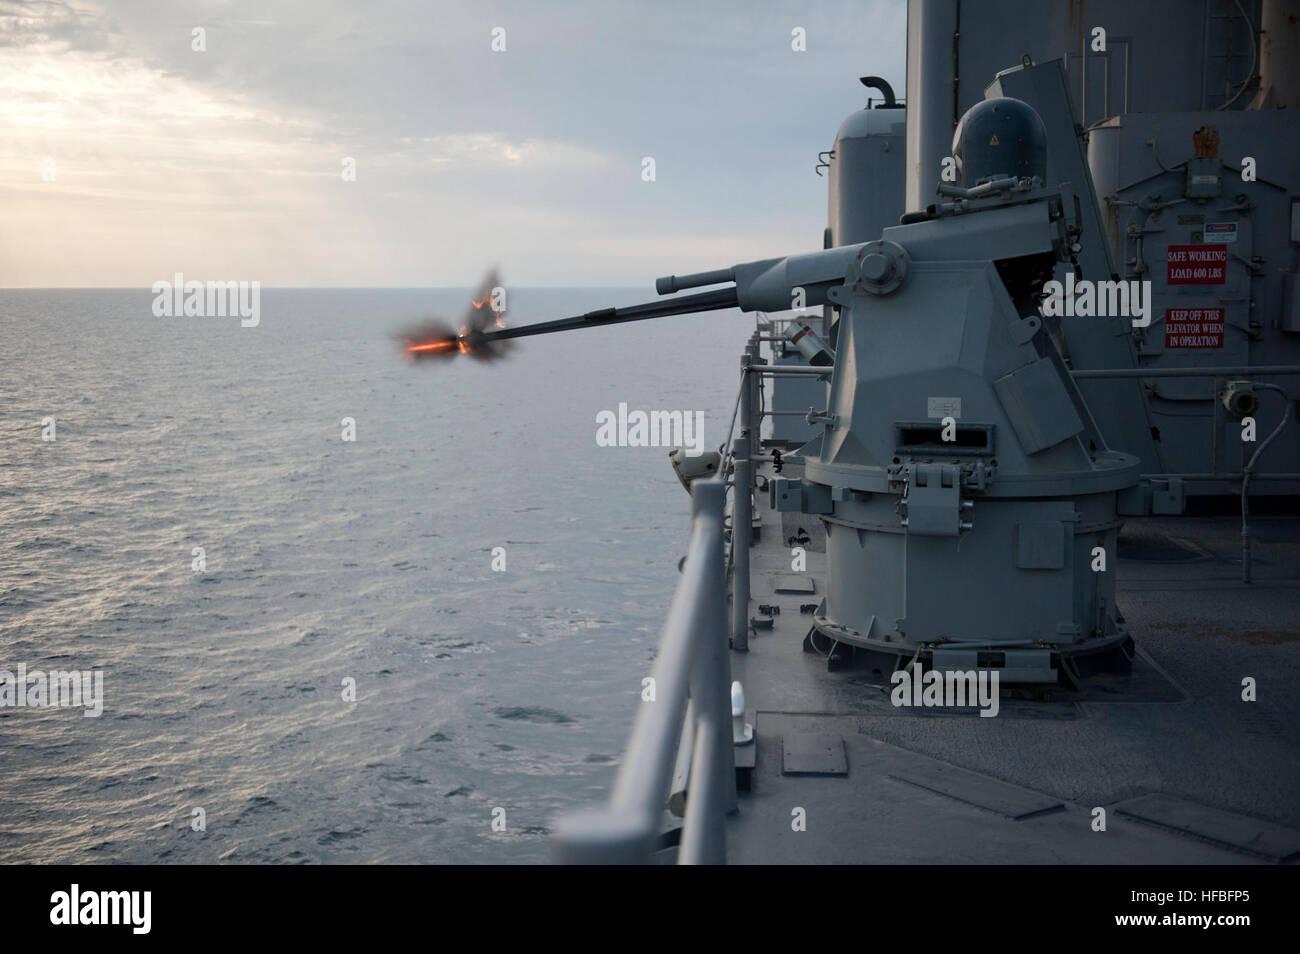 120127-N-KS651-510  ARABIAN GULF (Jan. 27, 2012) An MK38 MOD 2 25mm machine gun system aboard the amphibious dock - Stock Image